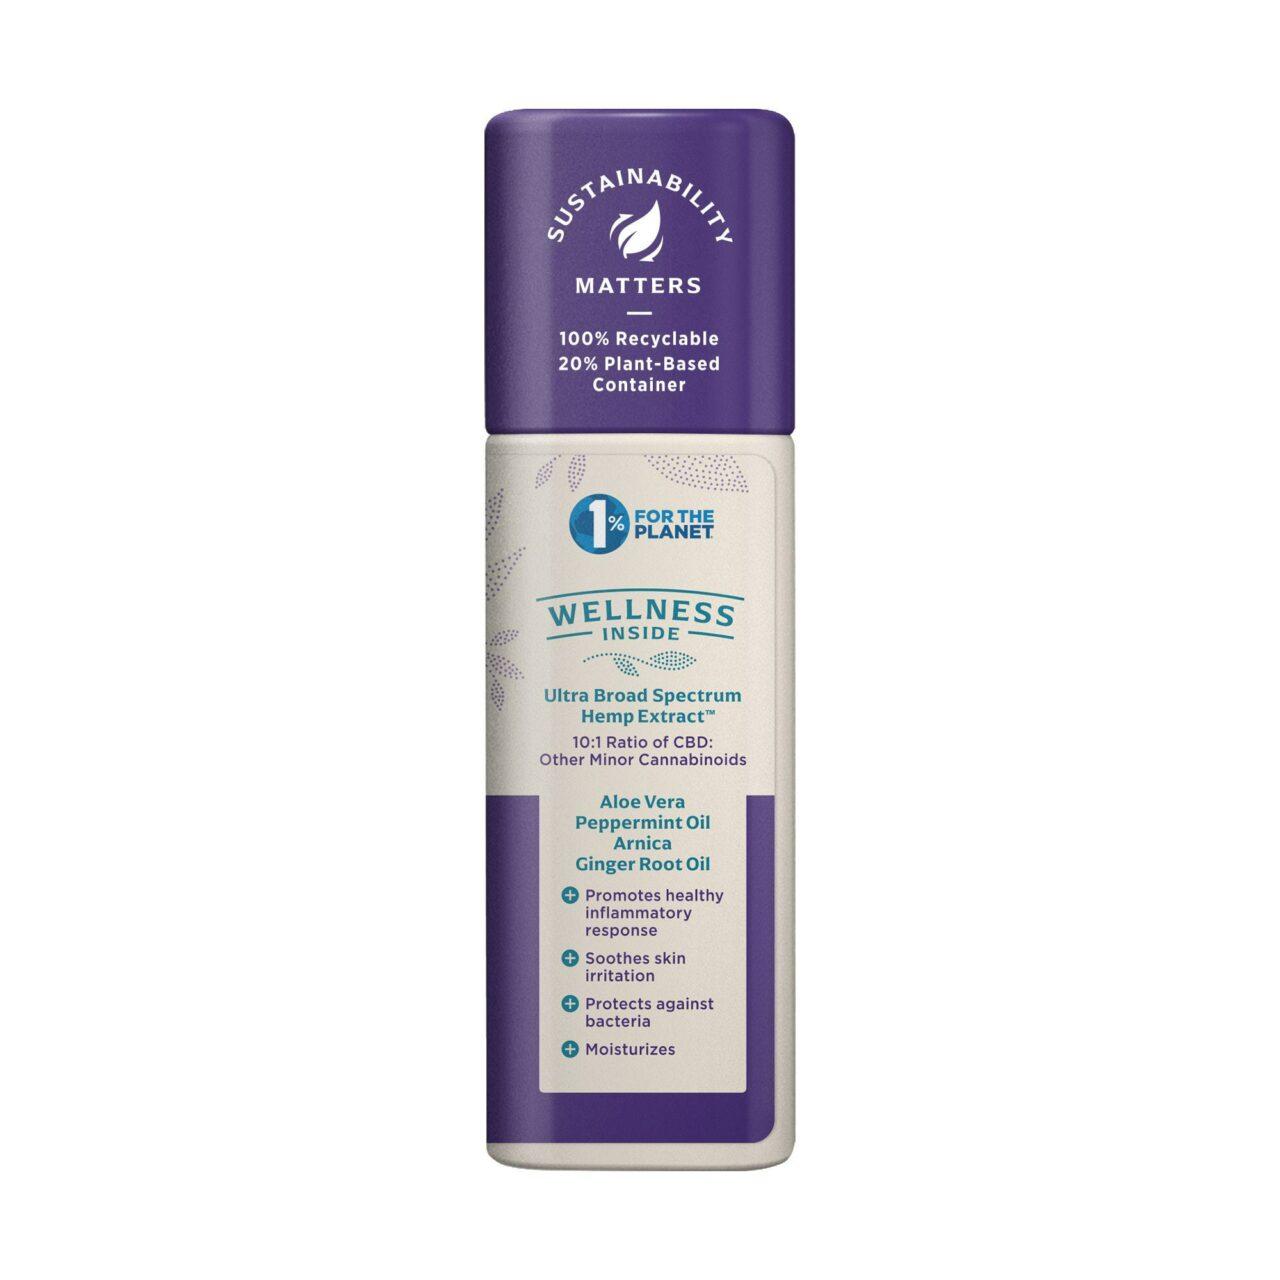 Medterra, Wellness Nature's Relief Daily CBD Cream, Broad Spectrum THC-Free, 1.7oz, 500mg CBD 2